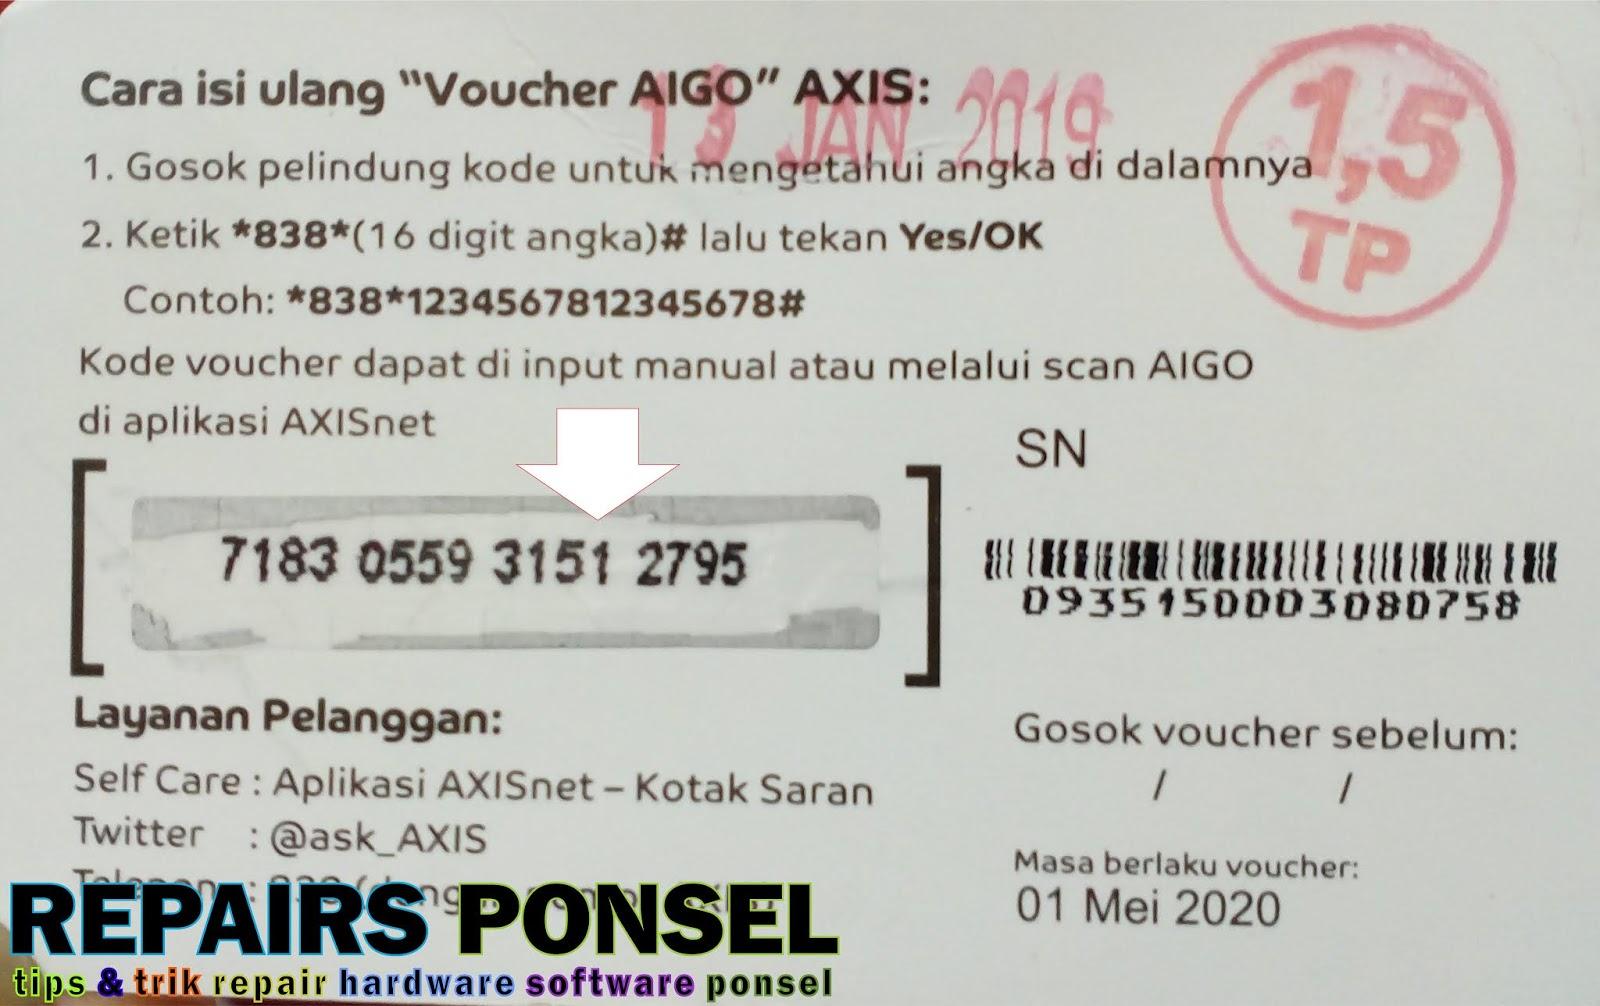 Cara isi Ulang Voucher Axis AIGO - Repairs Ponsel